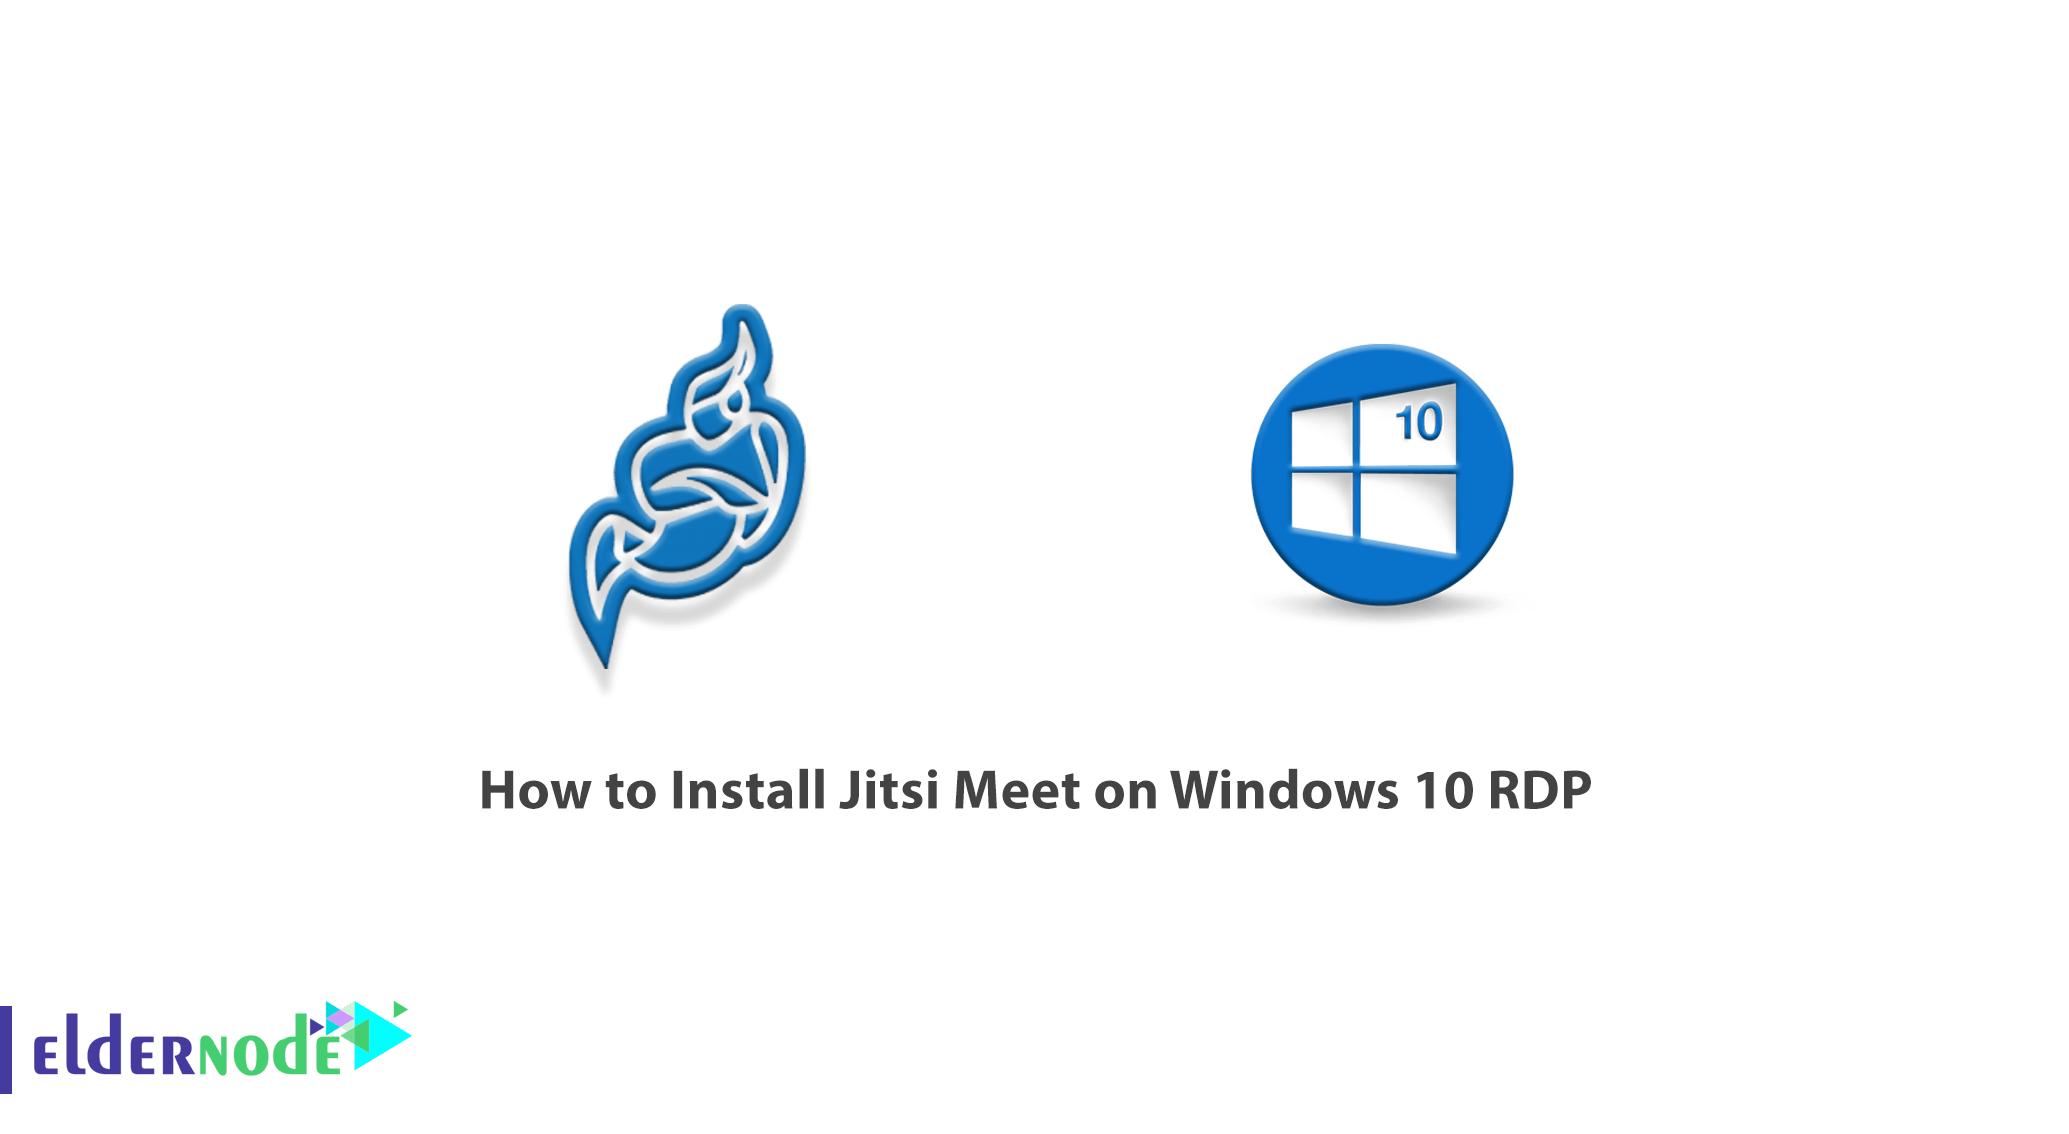 How to Install Jitsi Meet on Windows 10 RDP